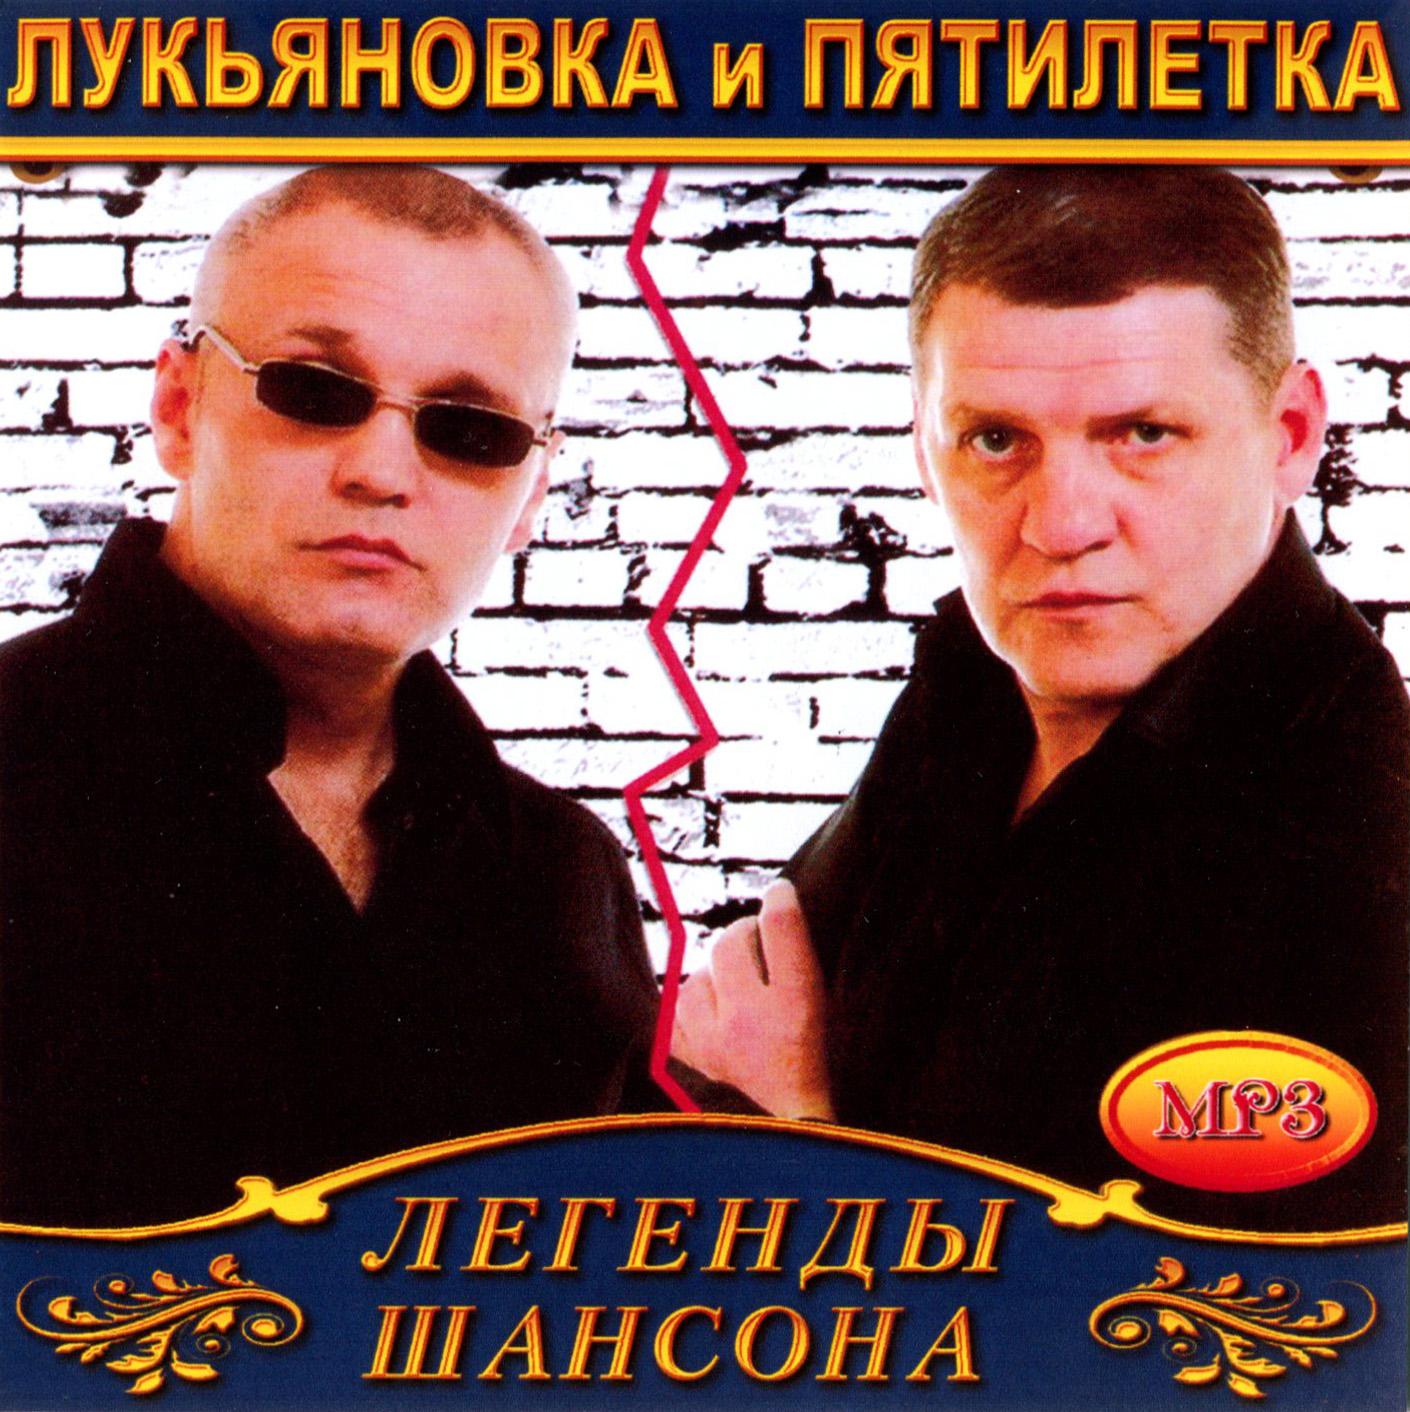 Лукьяновка & Пятилетка [mp3]